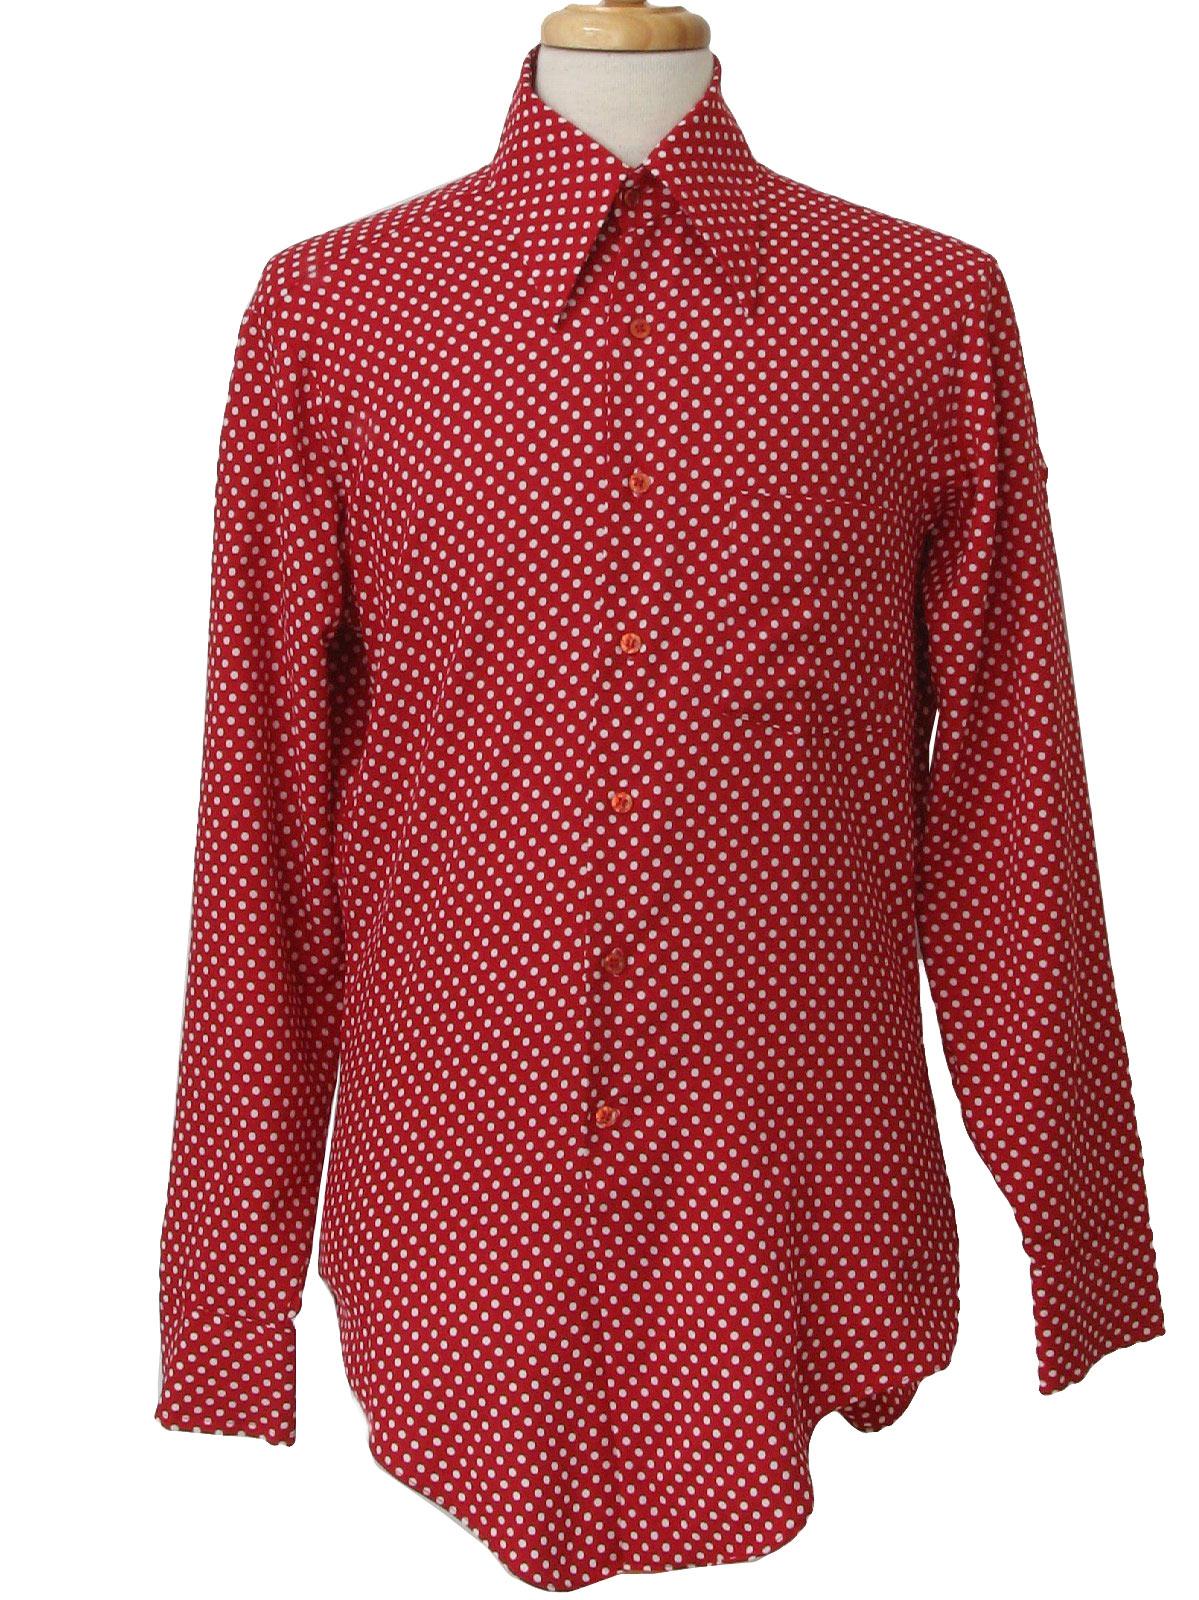 Mens red polka dot shirt greek t shirts for White red polka dot shirt